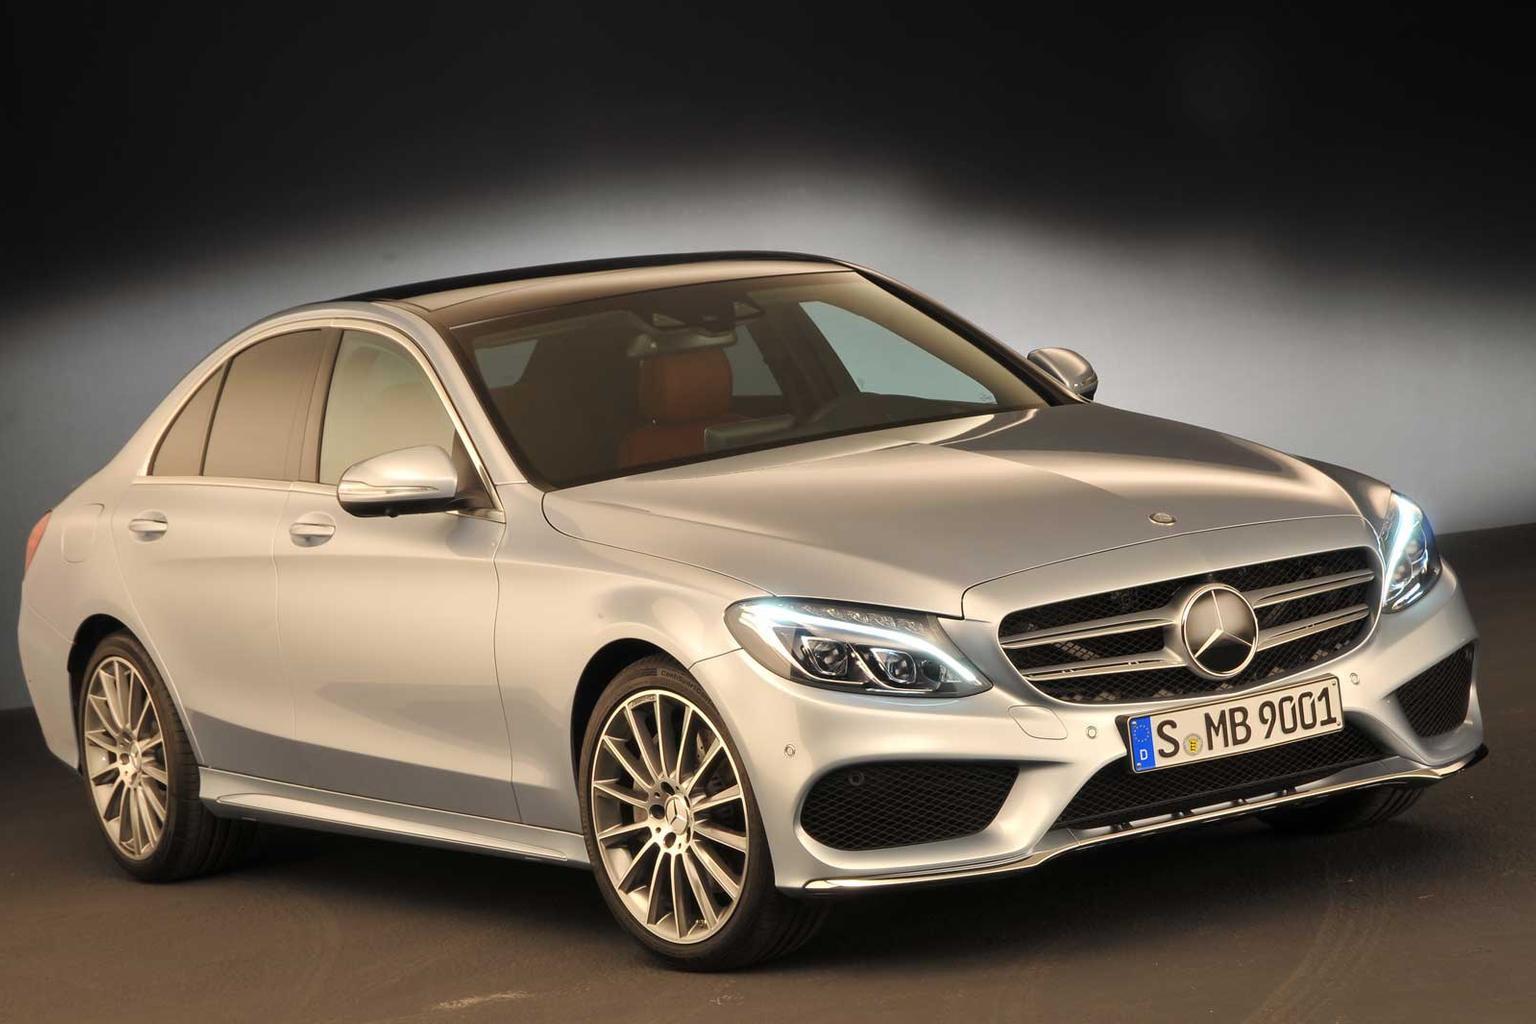 New Mercedes C-Class: '3 cyl tech not needed'